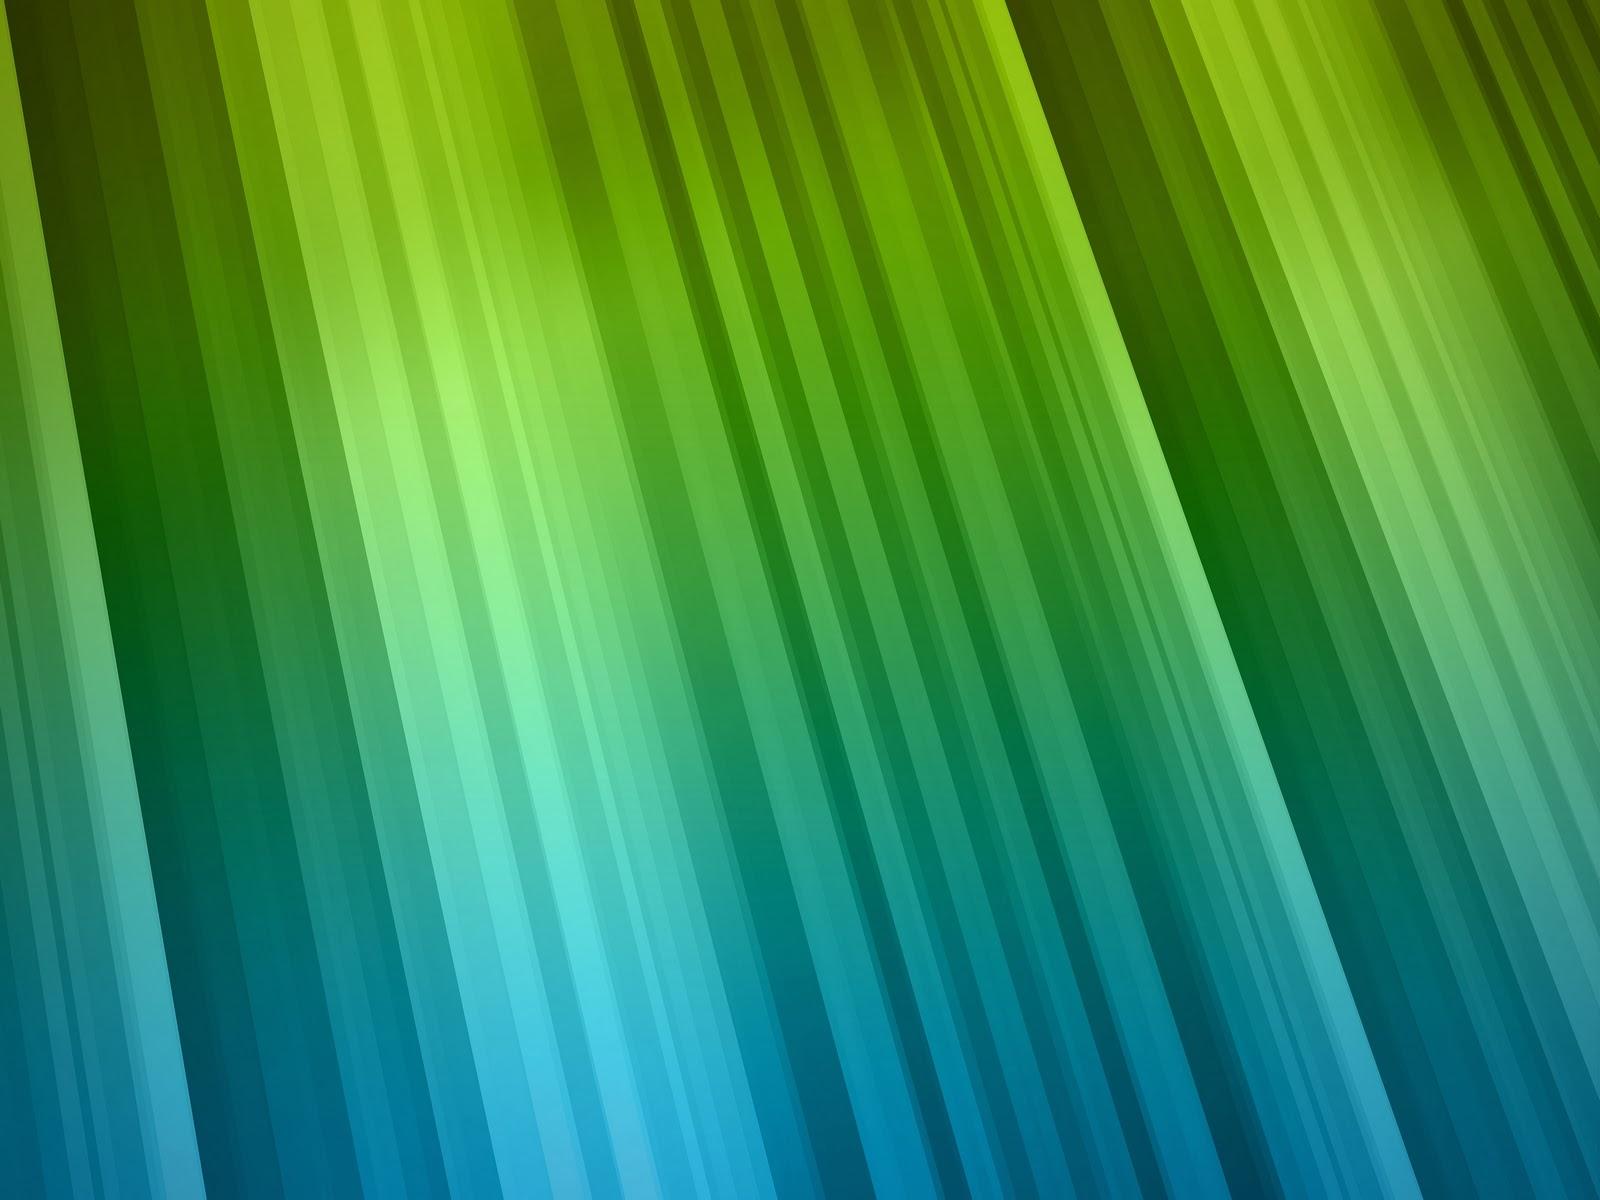 17 46 heru terate labels blue and green wallpaper green wallpaper